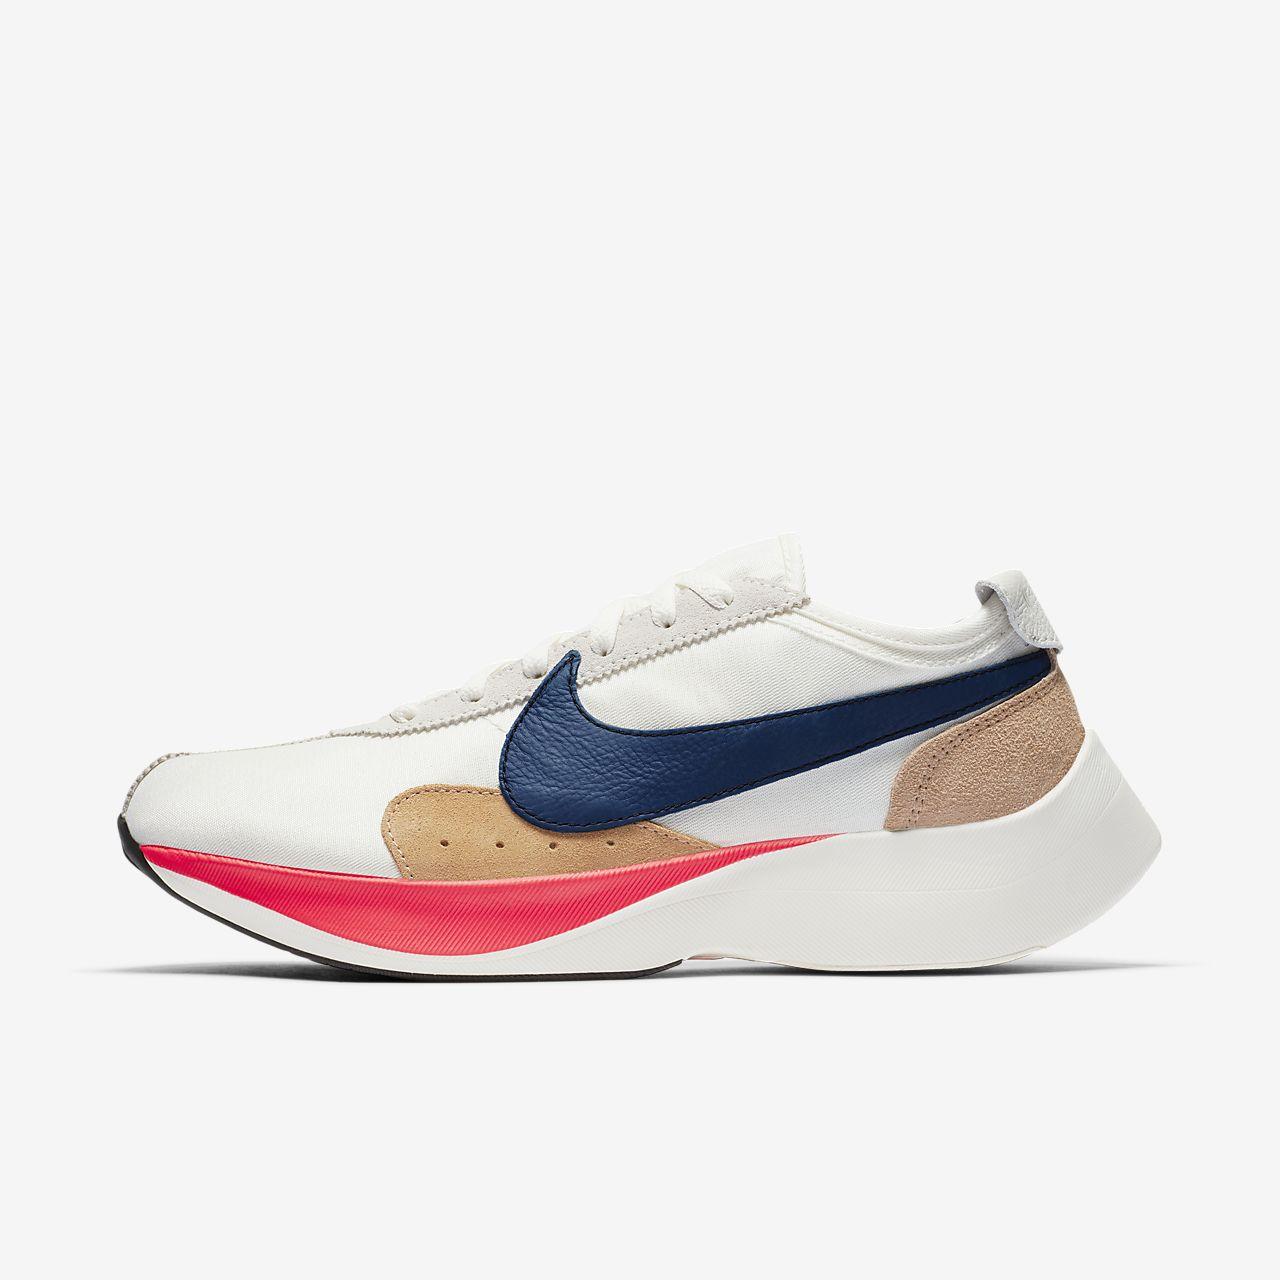 f4b40afc58 Nike Moon Racer QS Men s Shoe. Nike.com